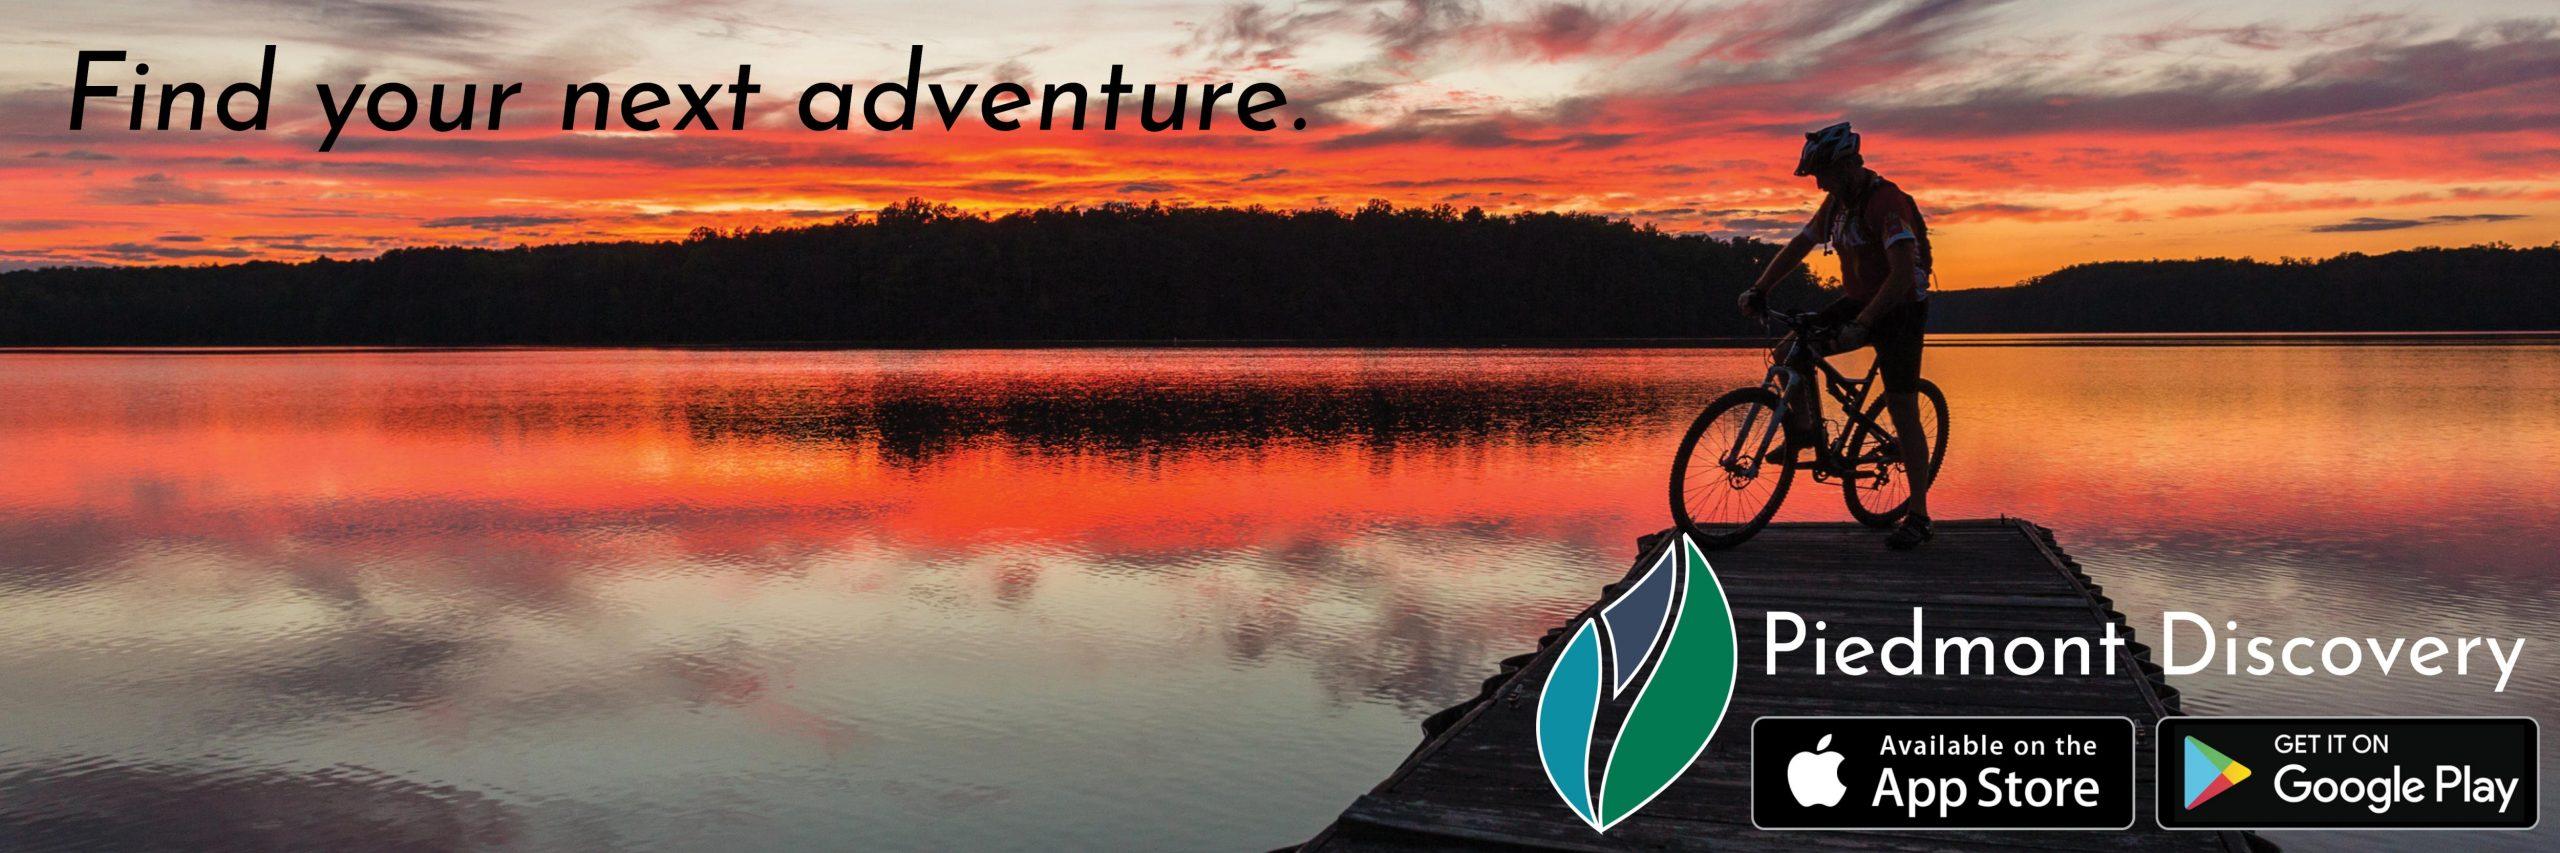 Piedmont Discovery App